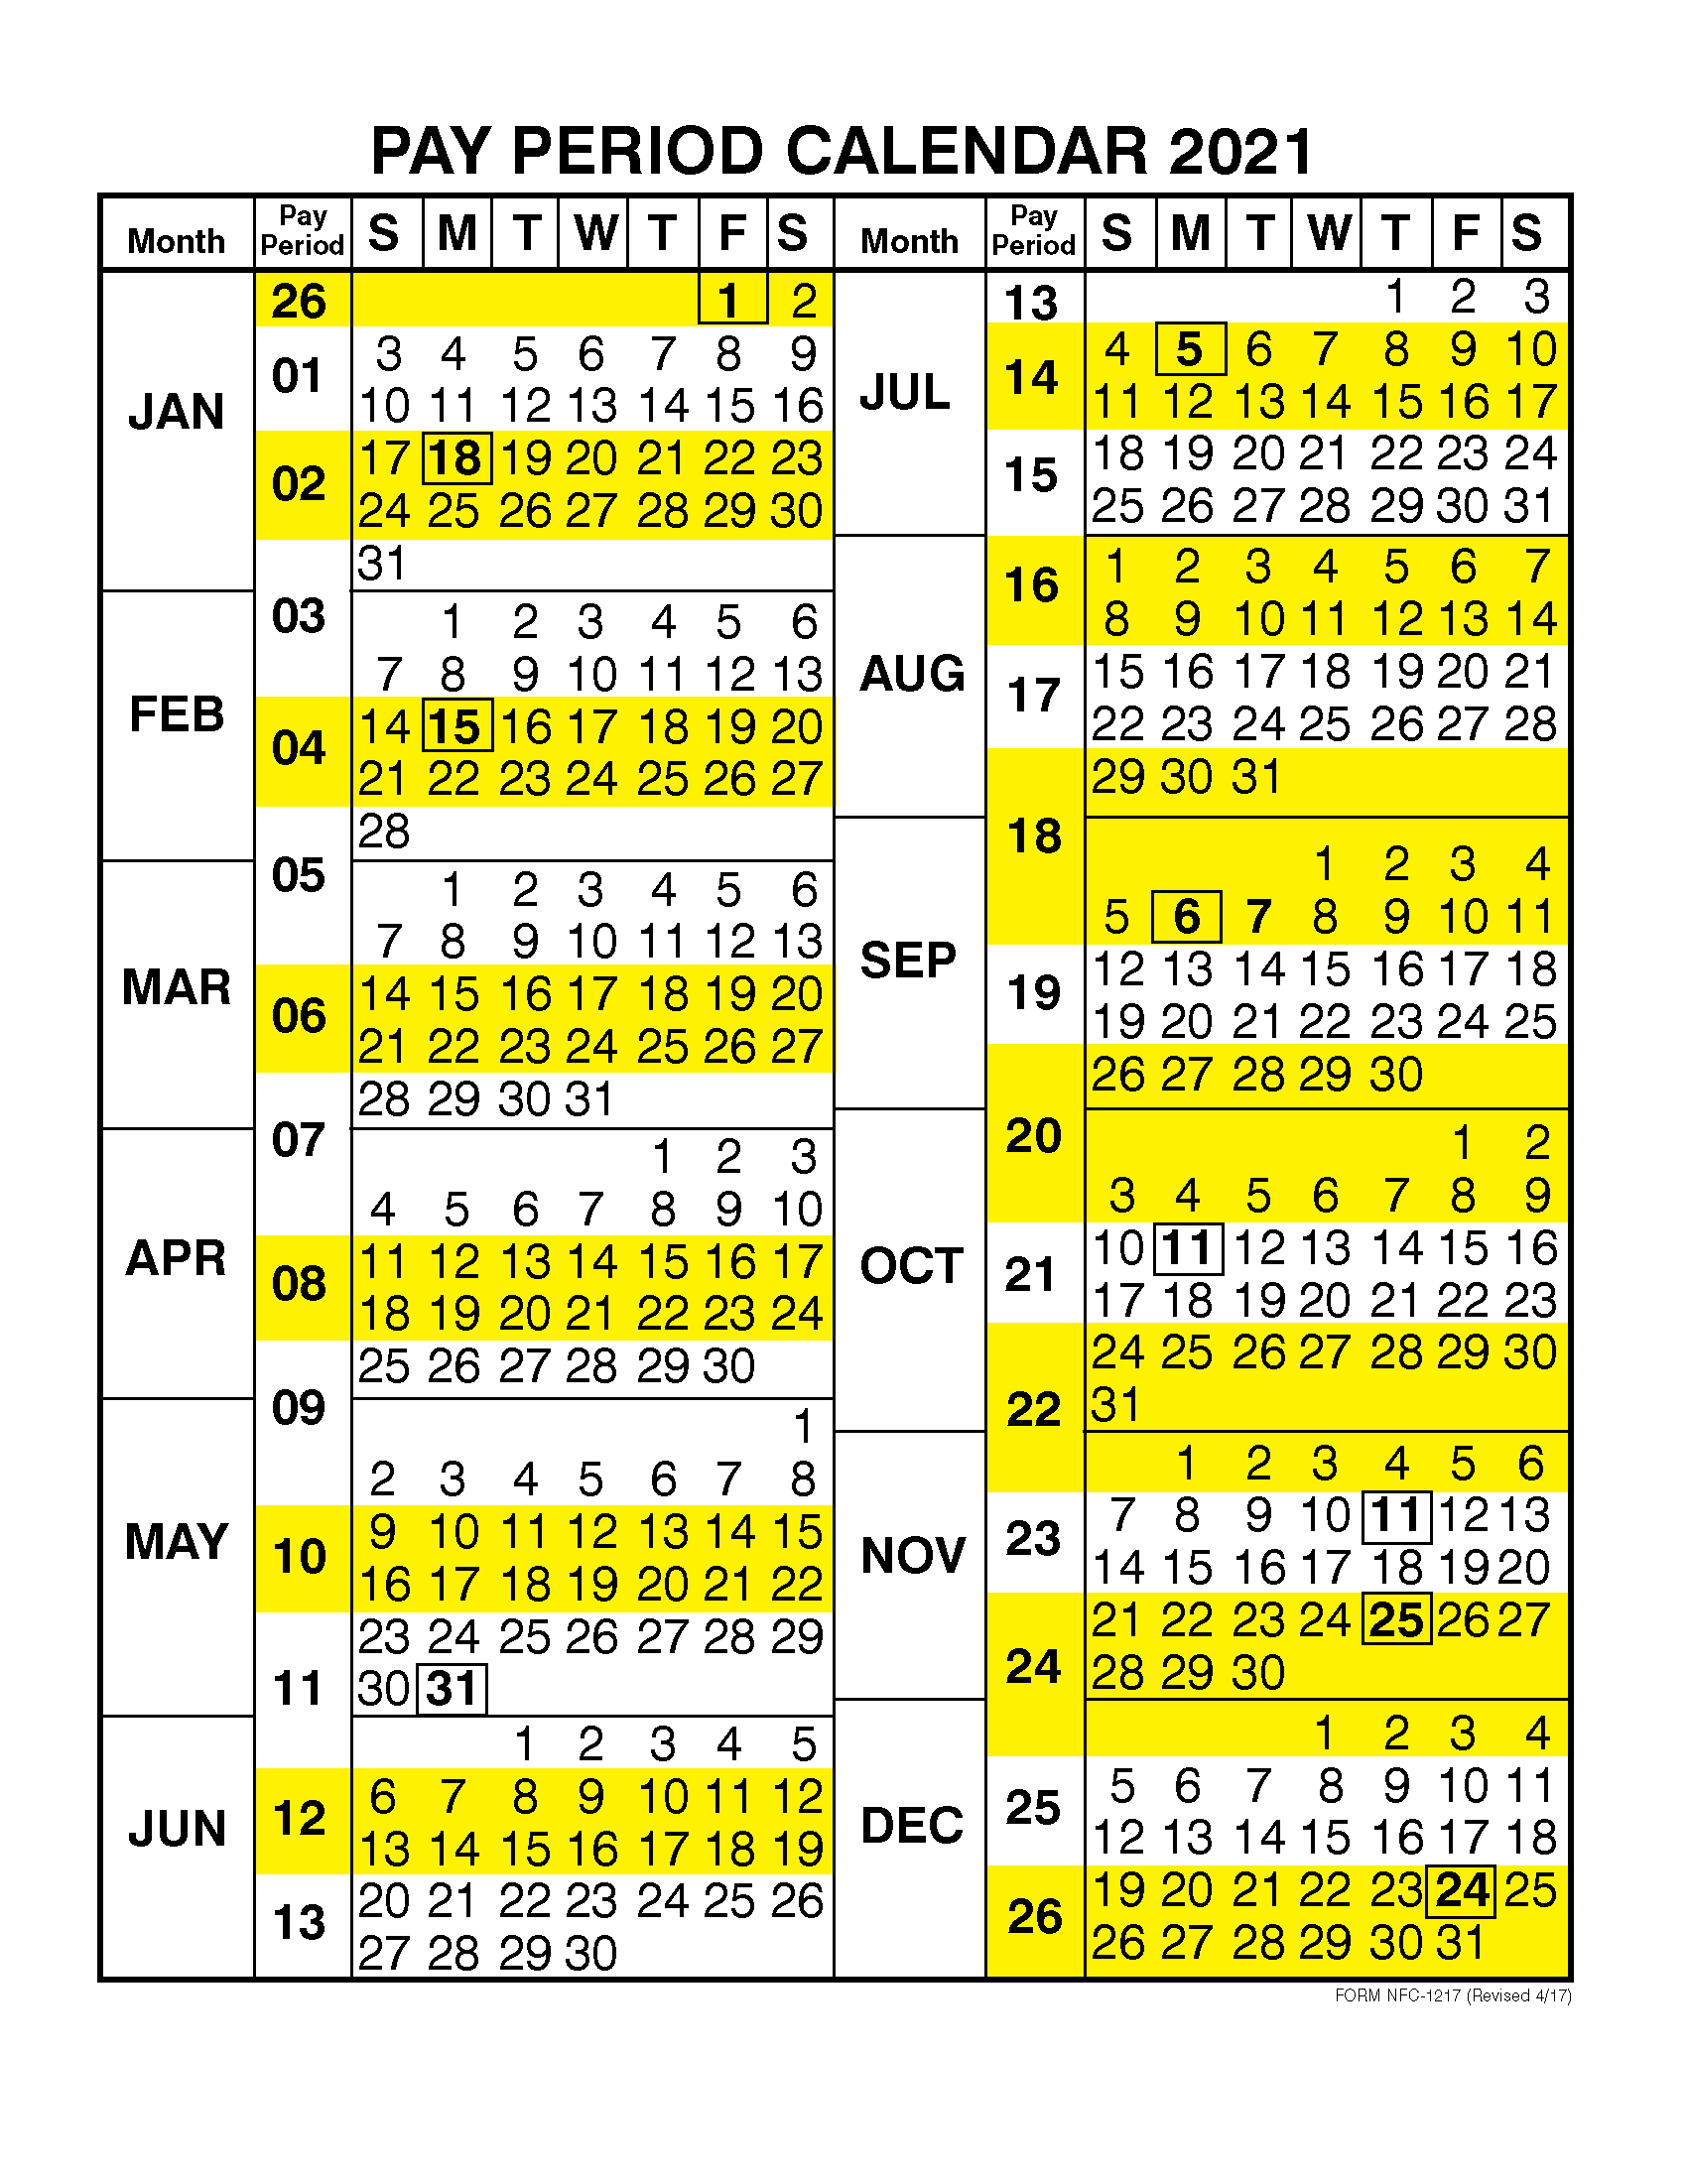 Federal Government Pay Calendar 2020 Opm | Payroll-2021Biweekly Payroll Calendar Template